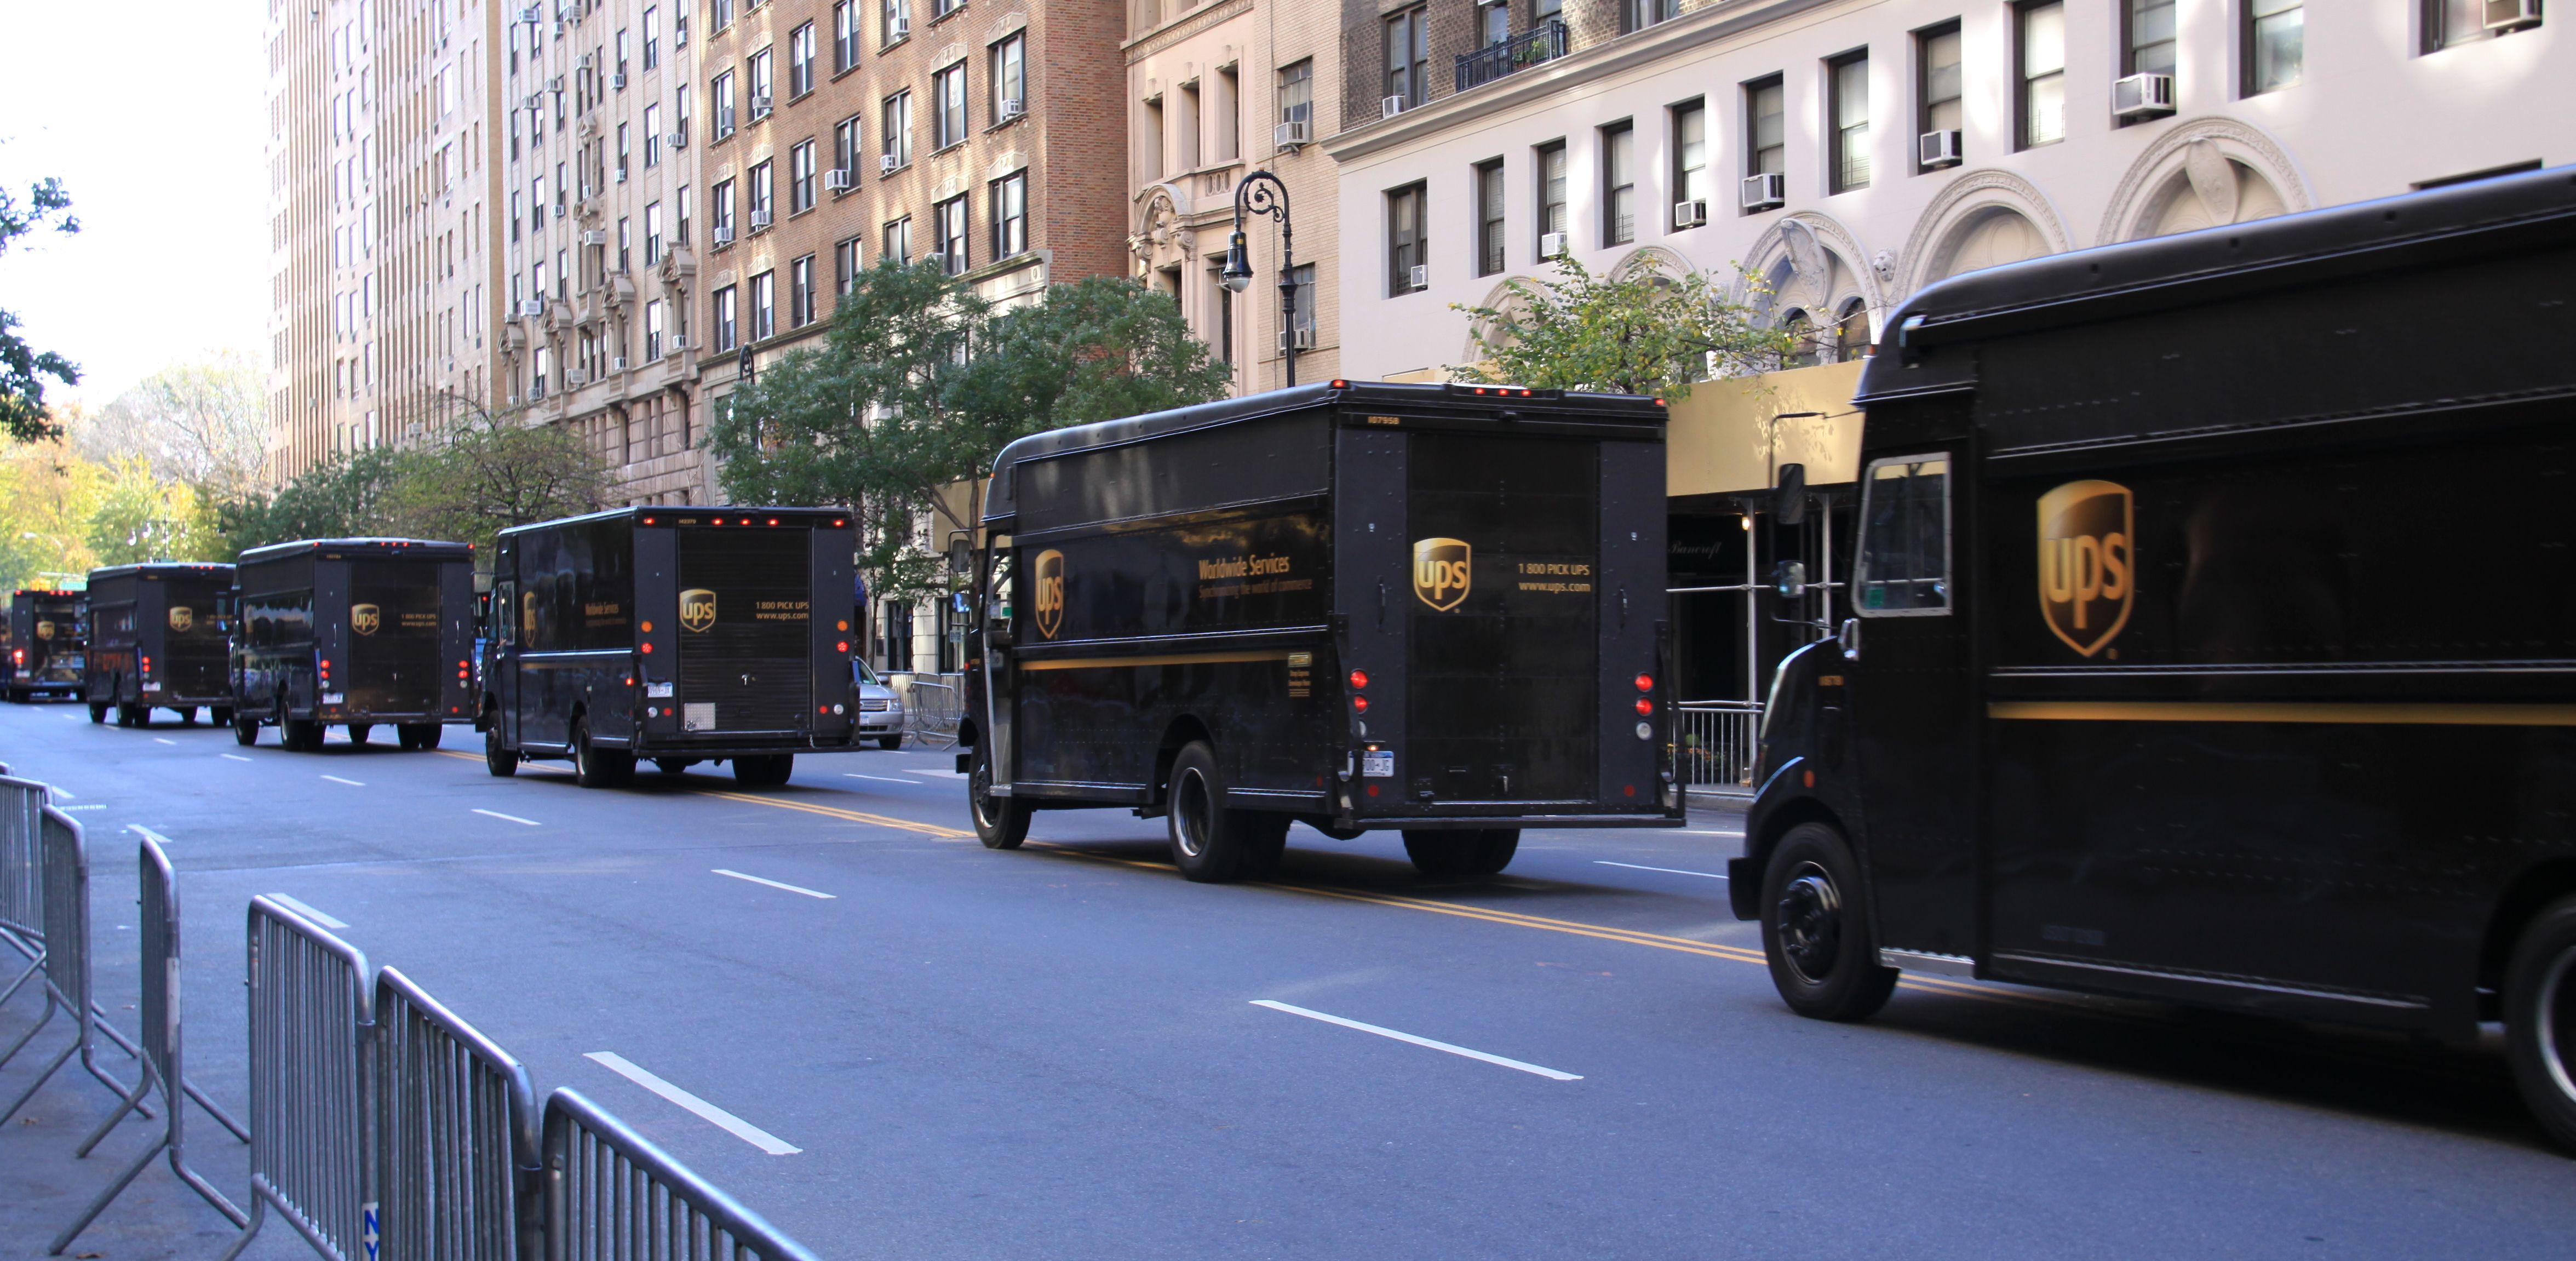 Ups Delivery Vehicles Ups Ups Parcel Ups Delivery